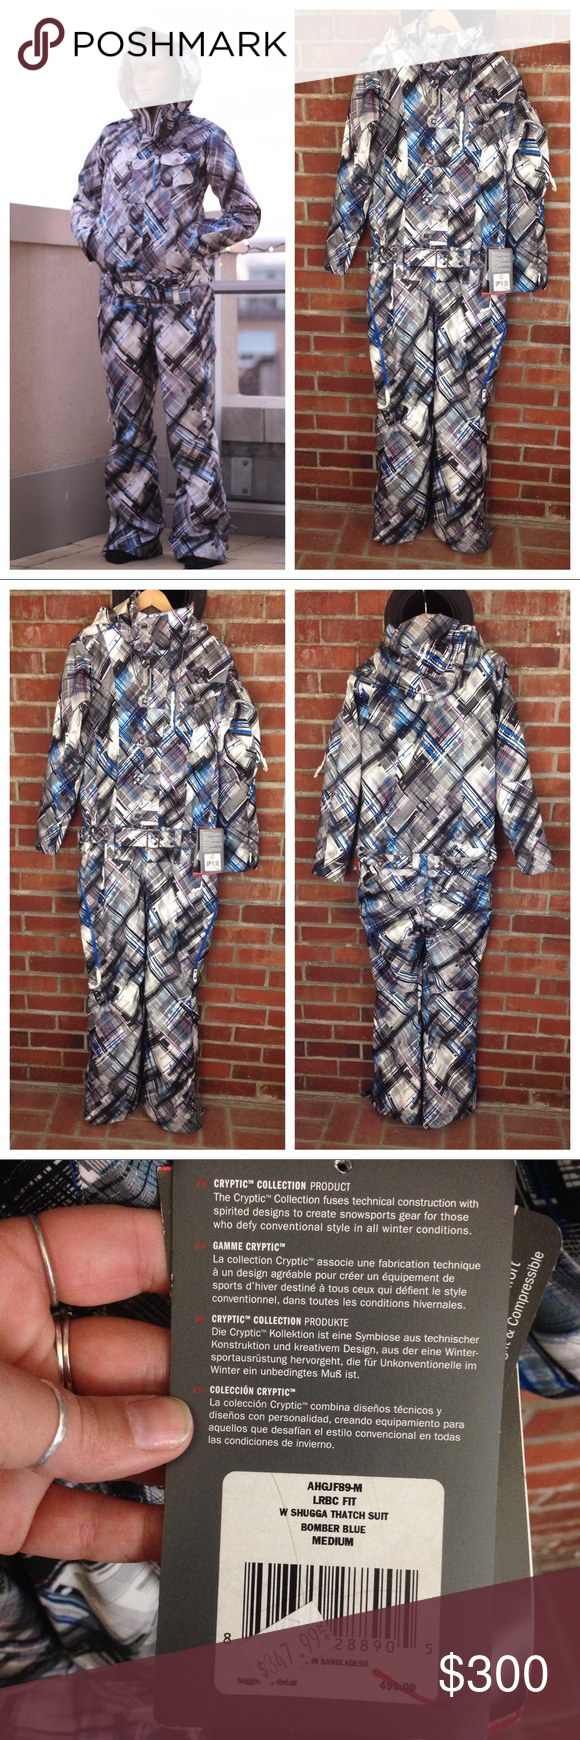 d39b9a9e3b34 TNF Shugga Cryptic Thatch Snow Ski Suit 1-Piece The Women s Shugga ...